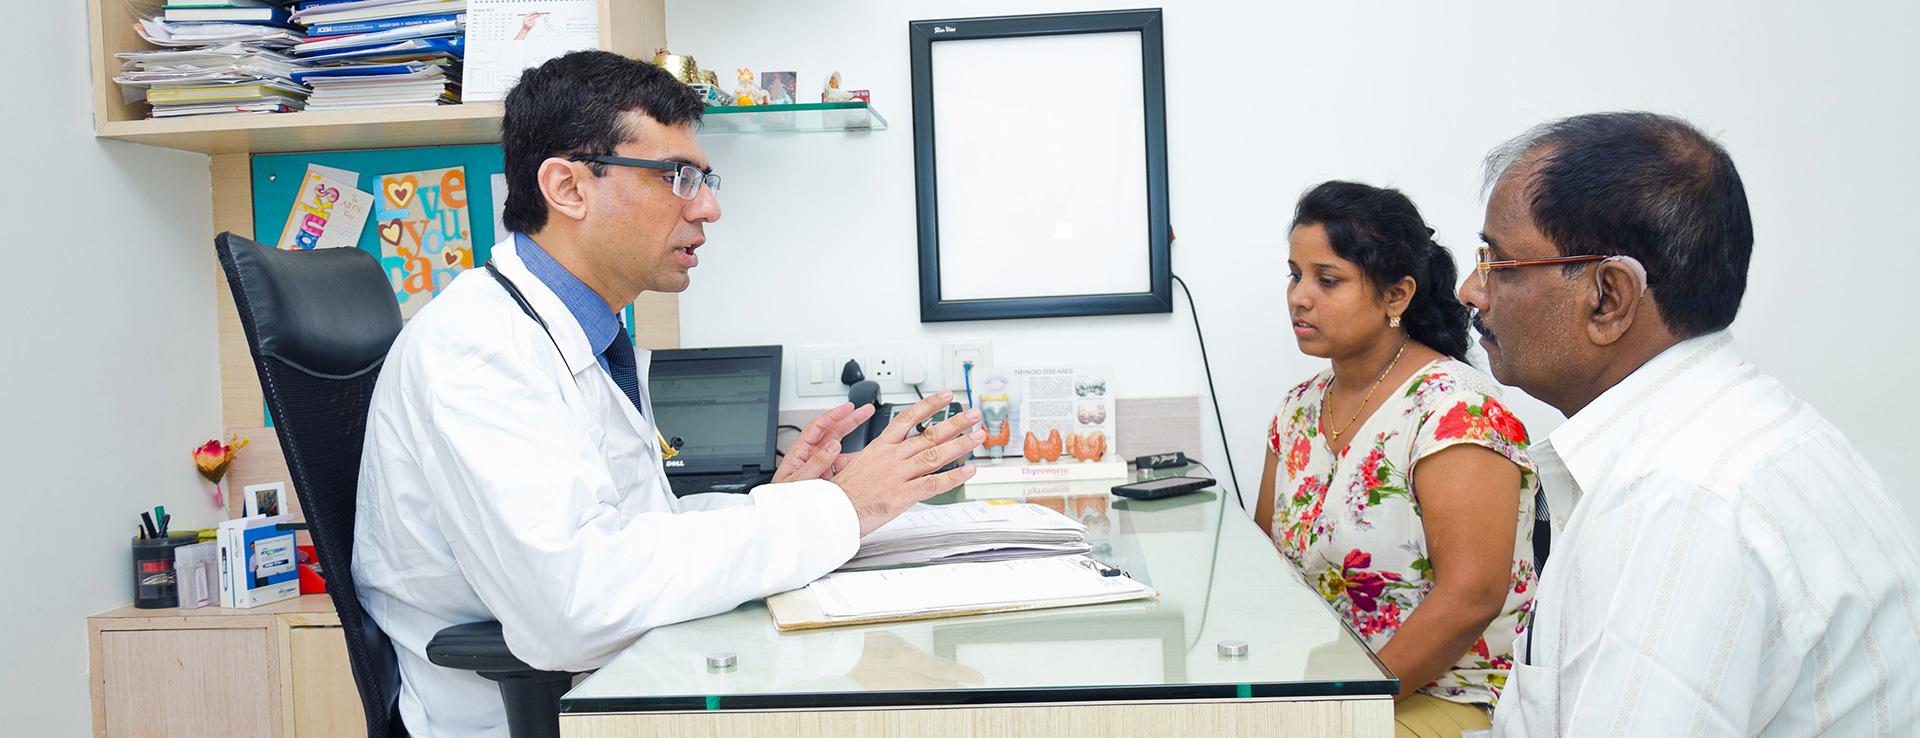 best-hospital-for-diabetes-in-mumbai